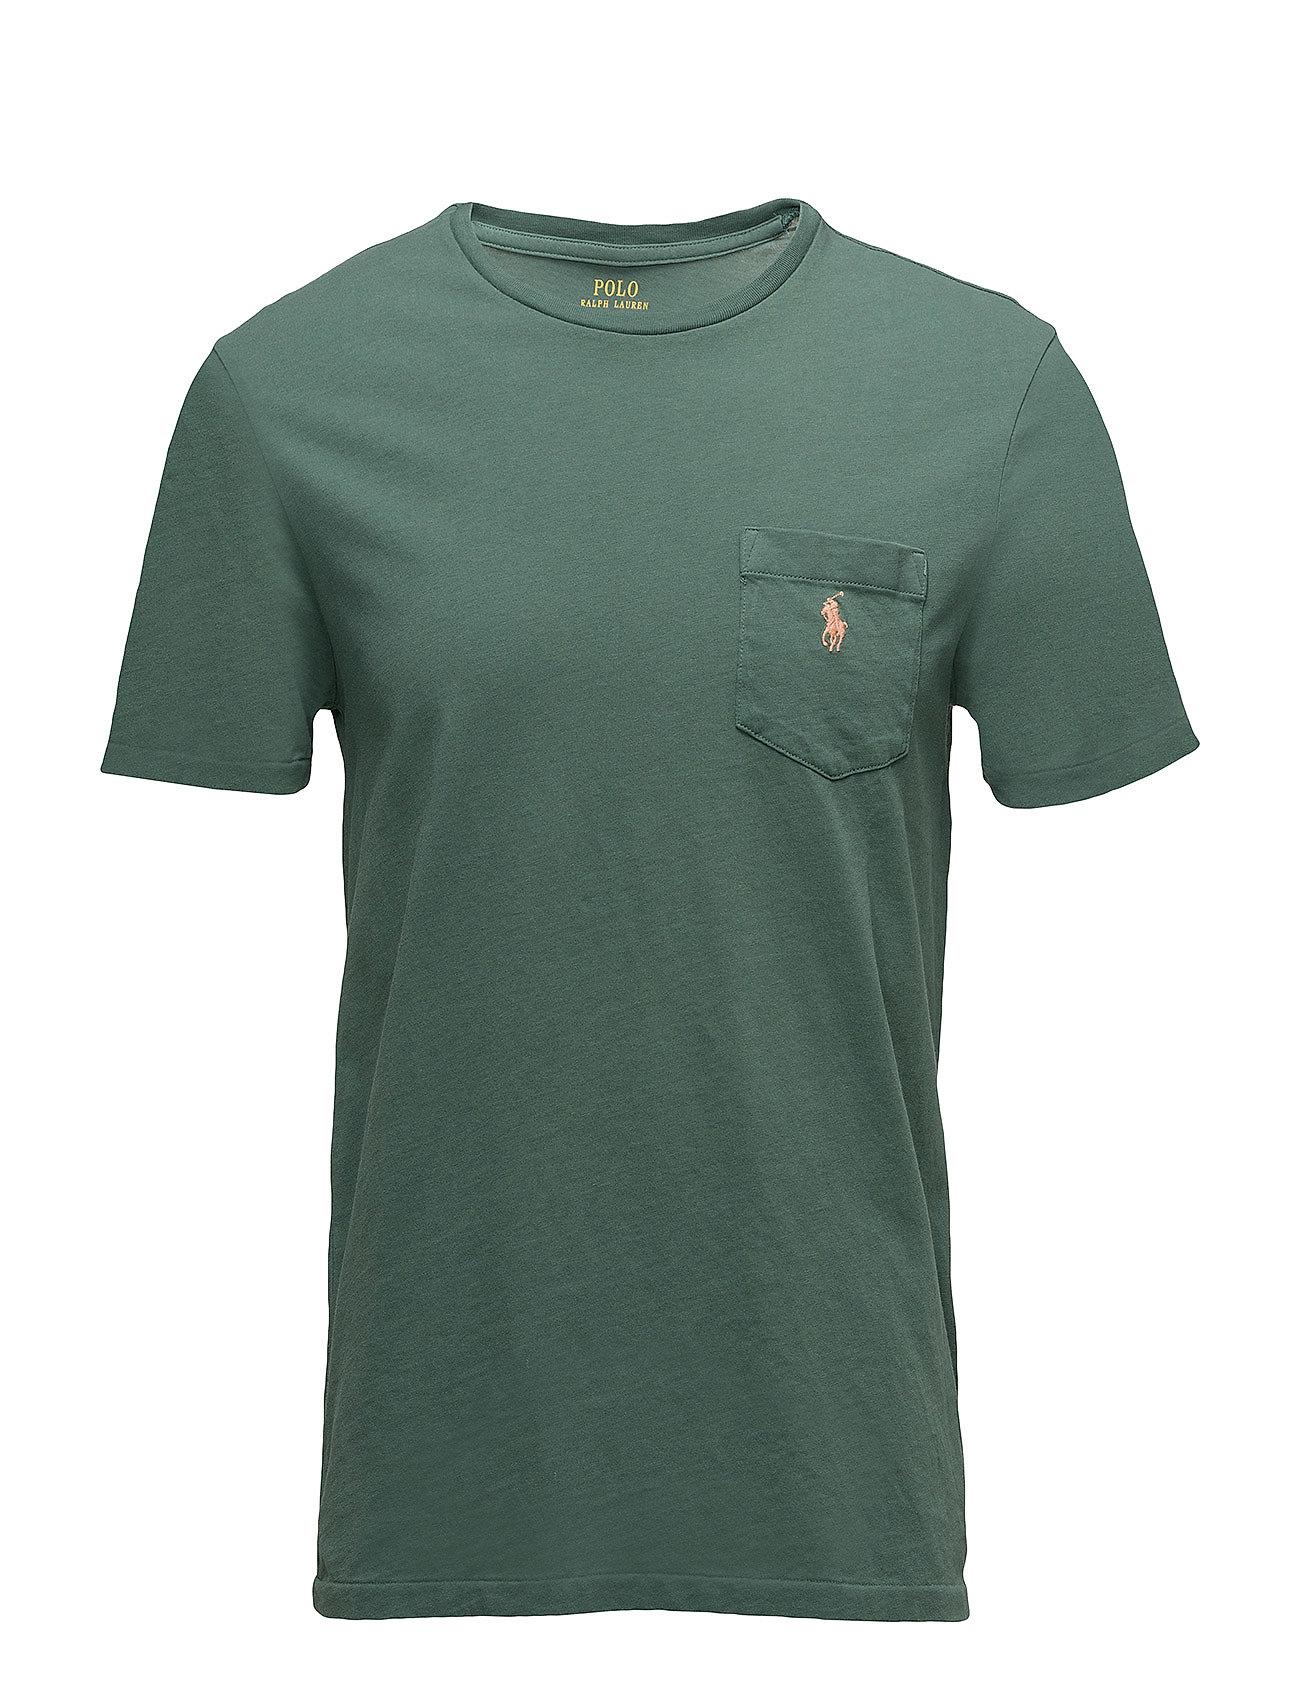 Custom slim fit cotton t shirt eucalyptus 49 polo for Polo custom fit t shirts